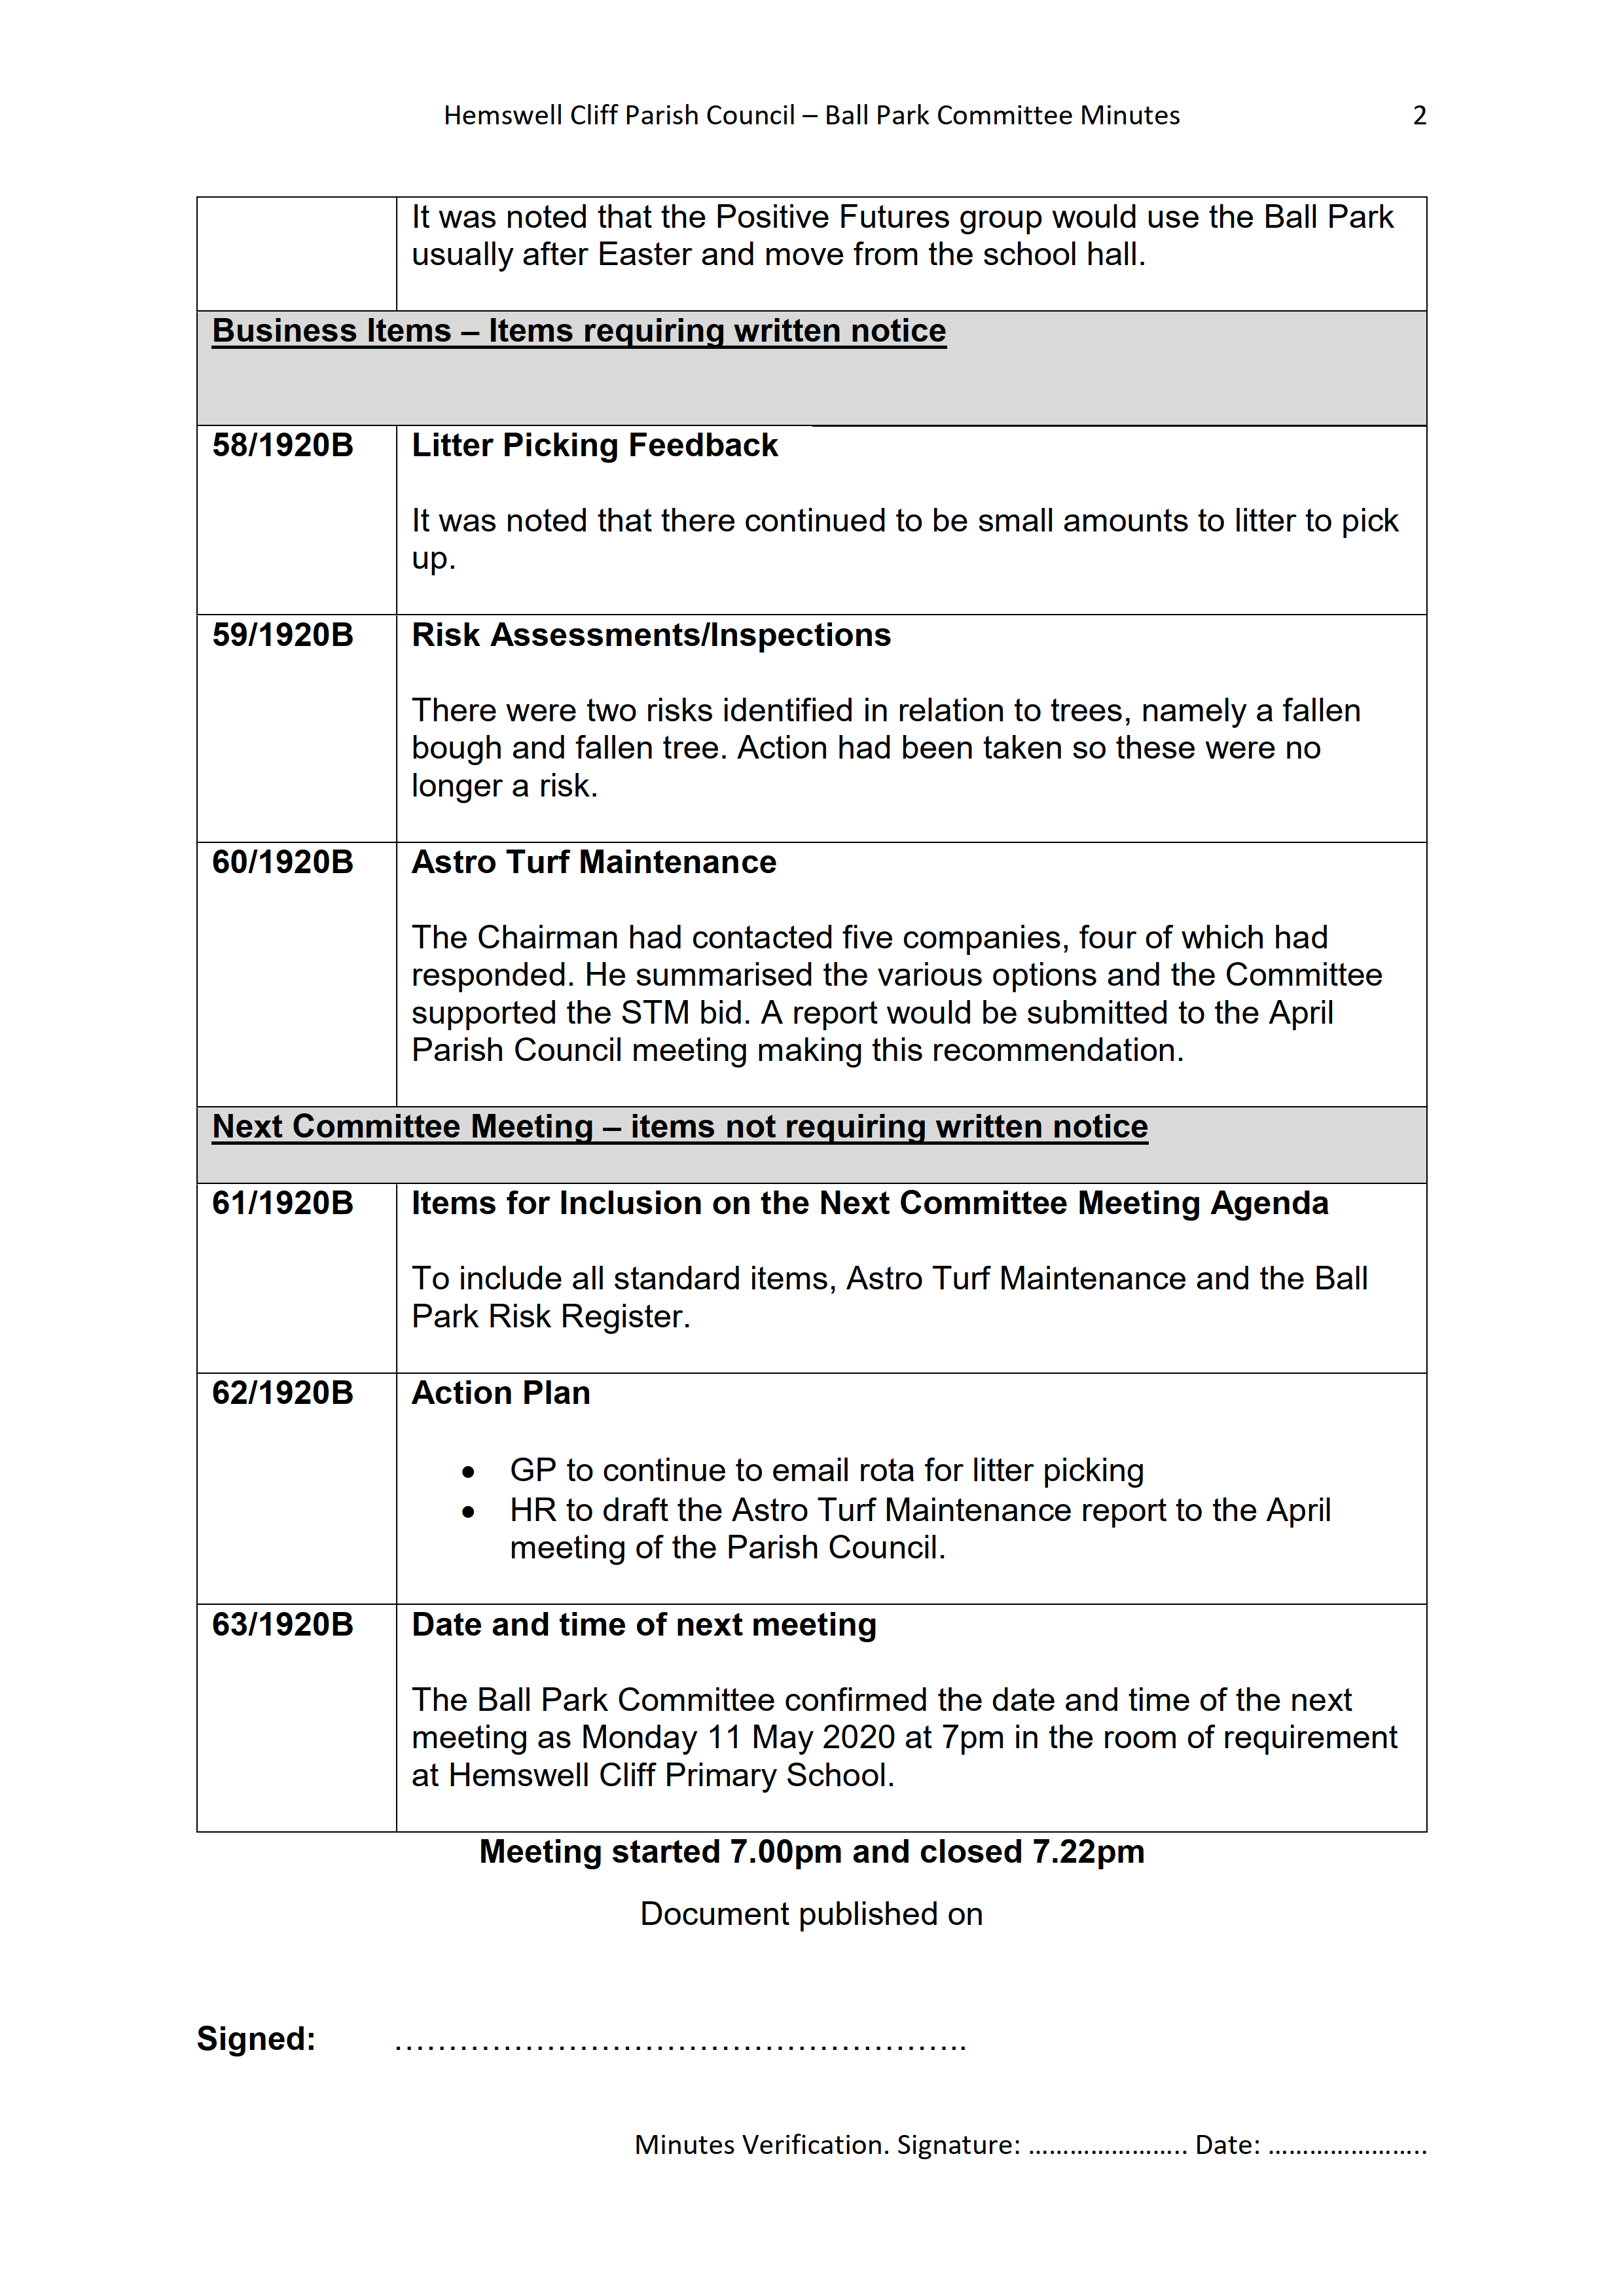 HCPC_BallPark_Minutes_02.03.20_2.png